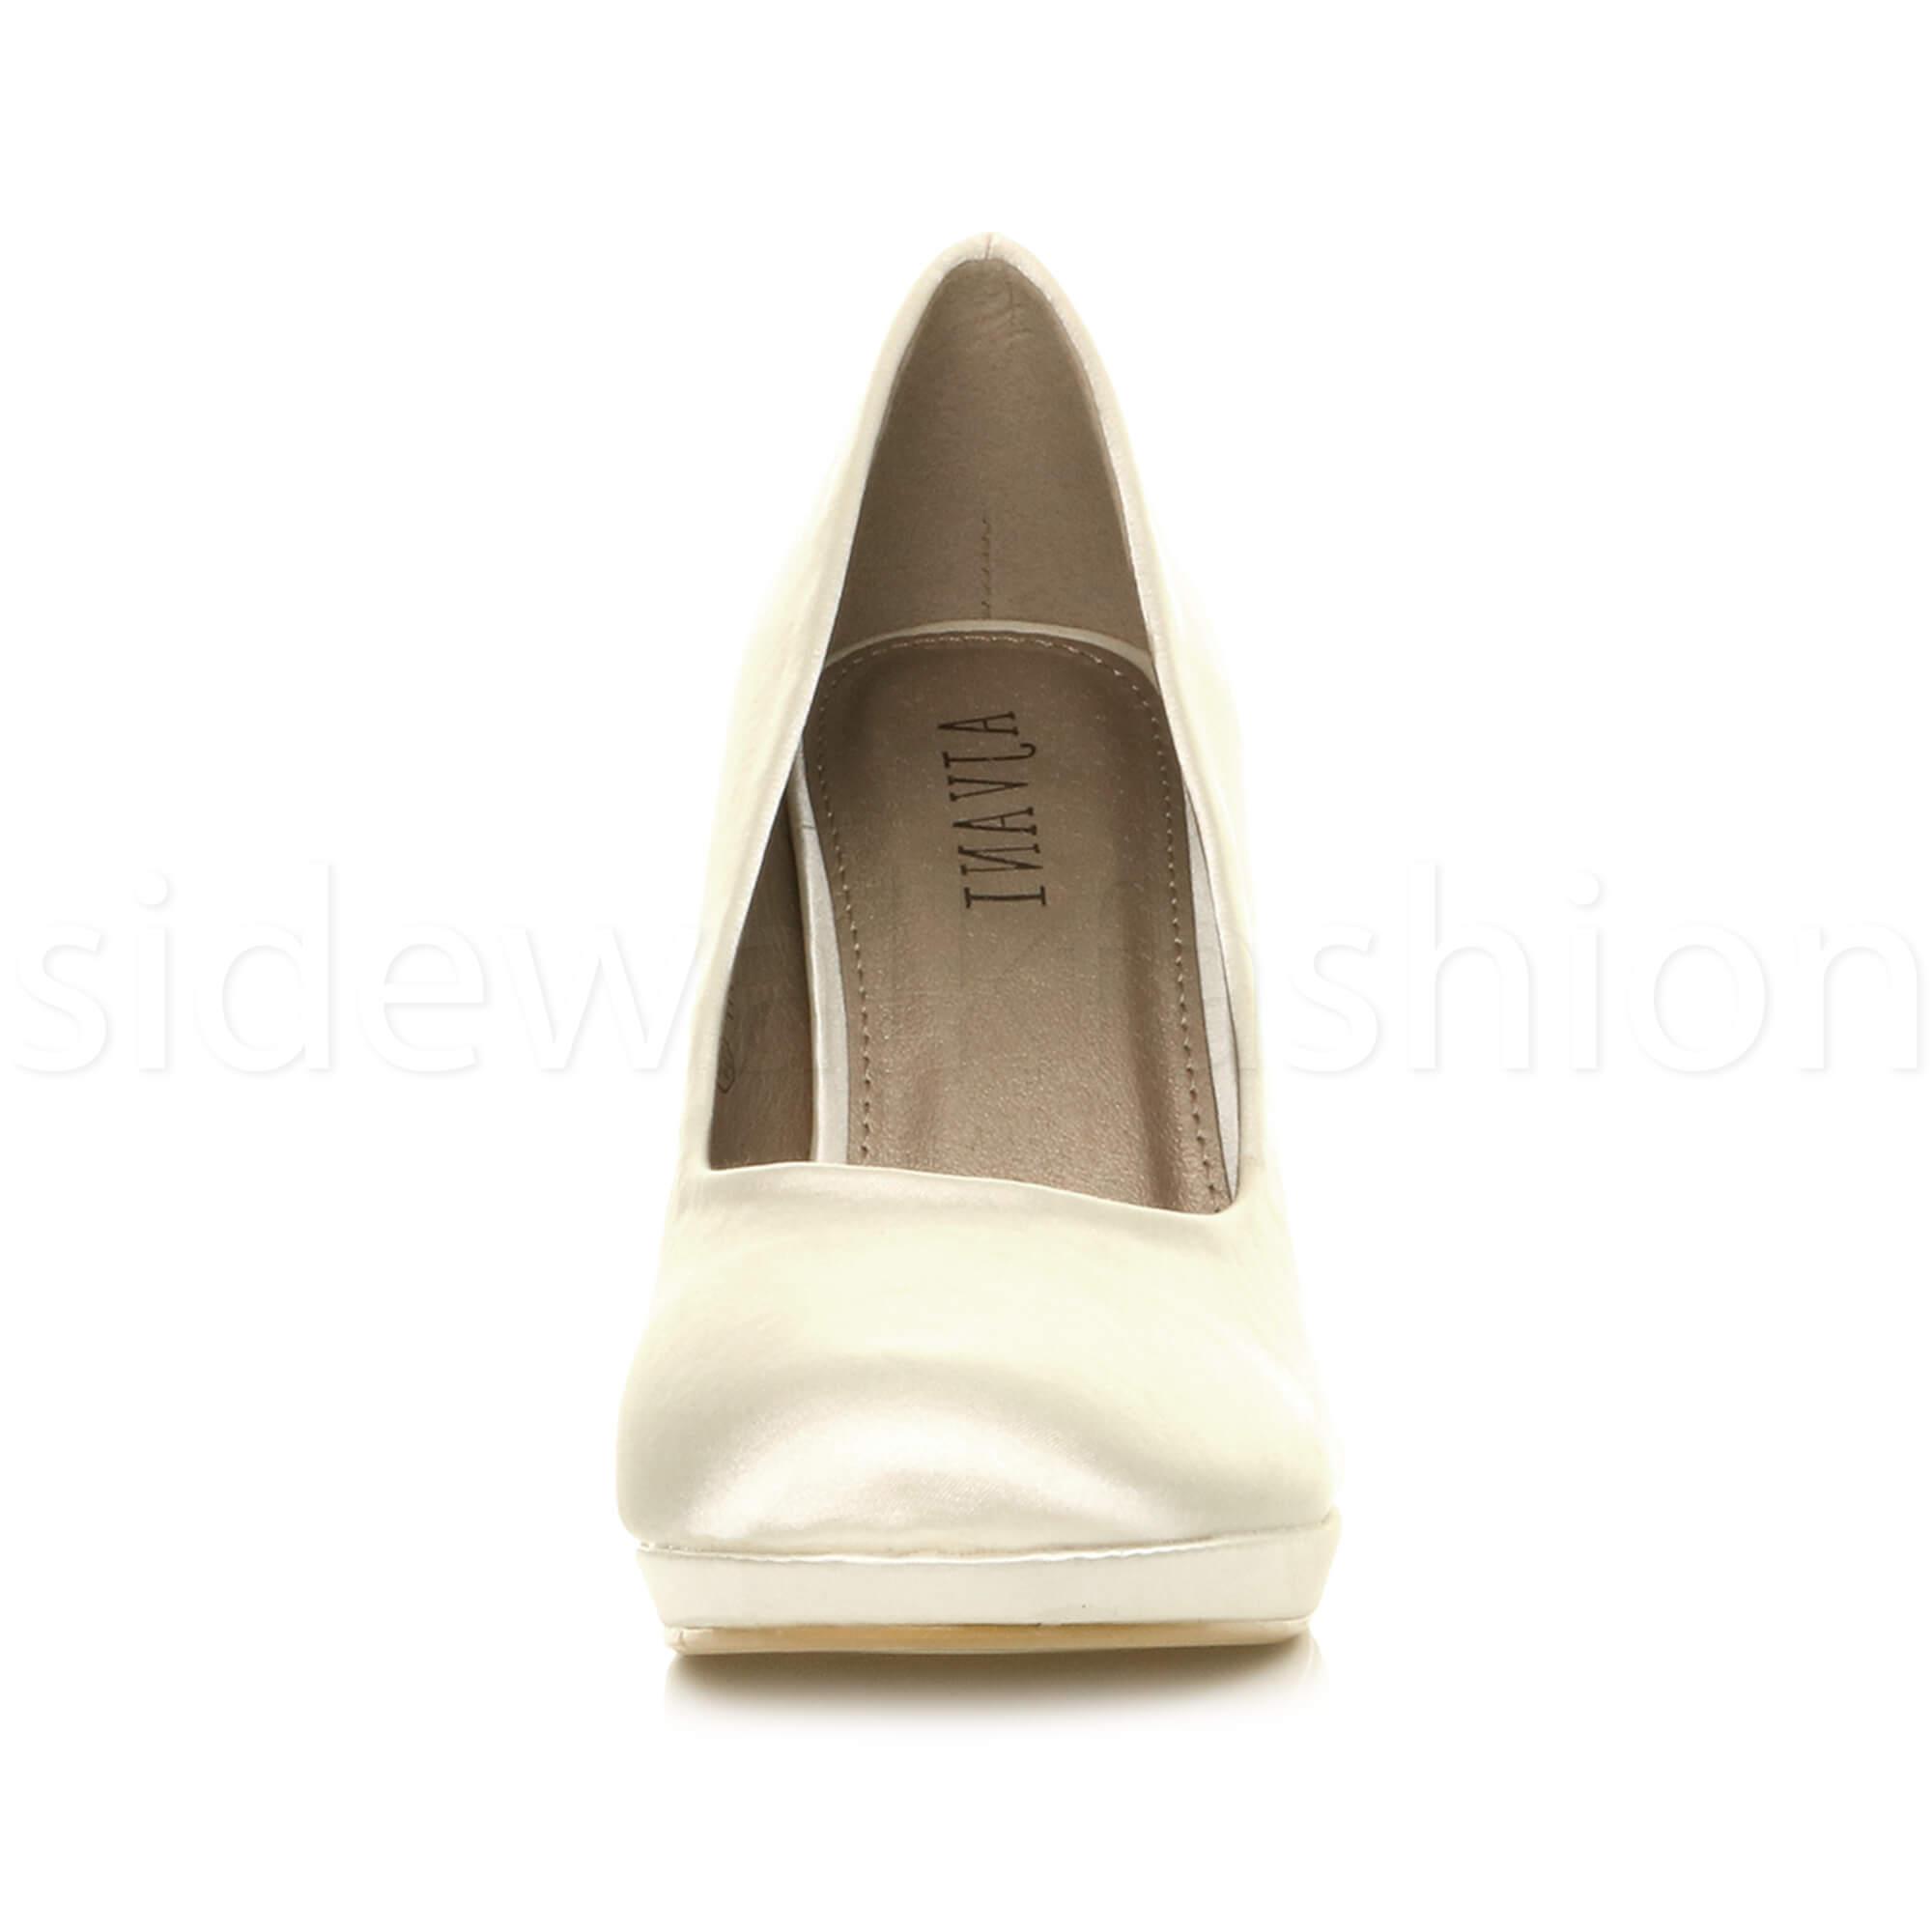 Womens-ladies-high-mid-heel-platform-wedding-evening-bridesmaid-court-shoes-size thumbnail 97